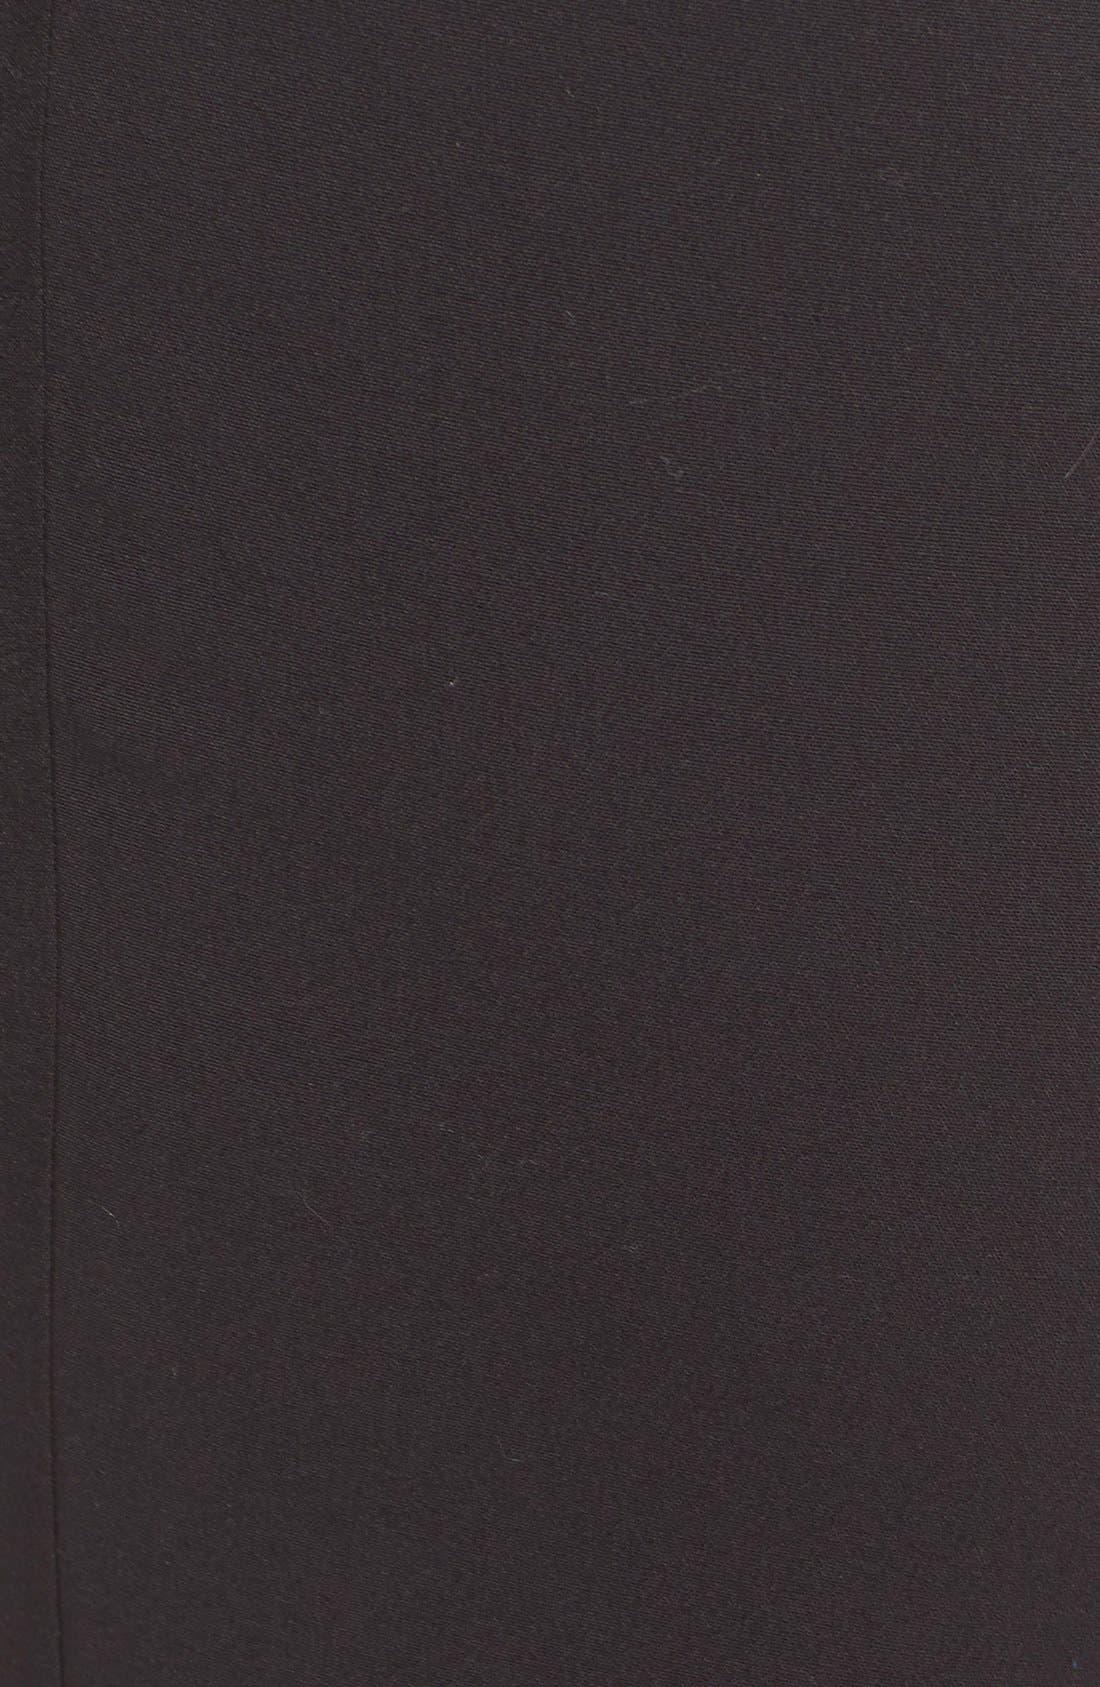 """Gramercy' Two-Pocket Pants,                             Alternate thumbnail 5, color,                             001"